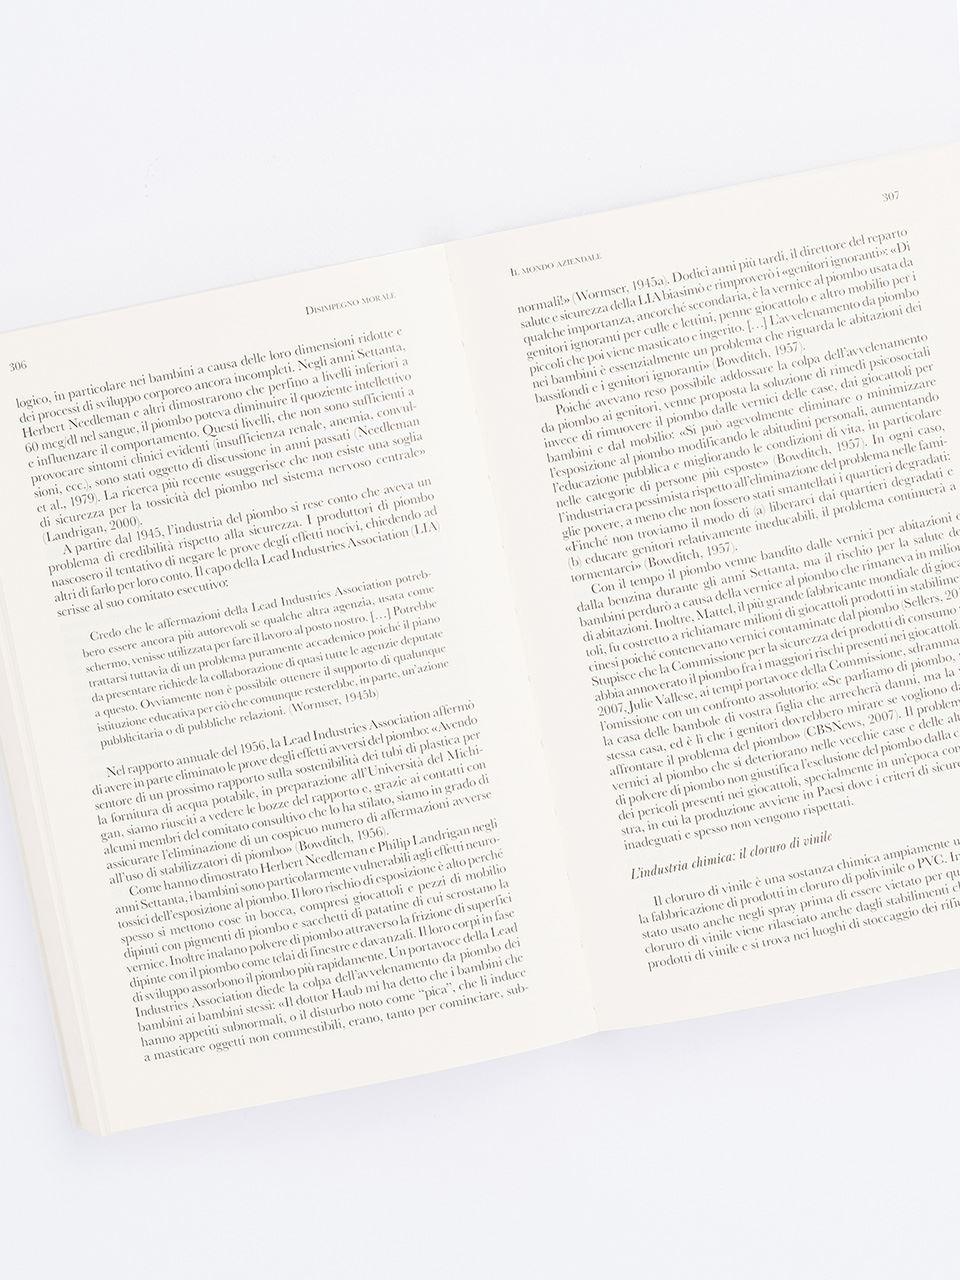 Disimpegno morale - Libri - Erickson 2